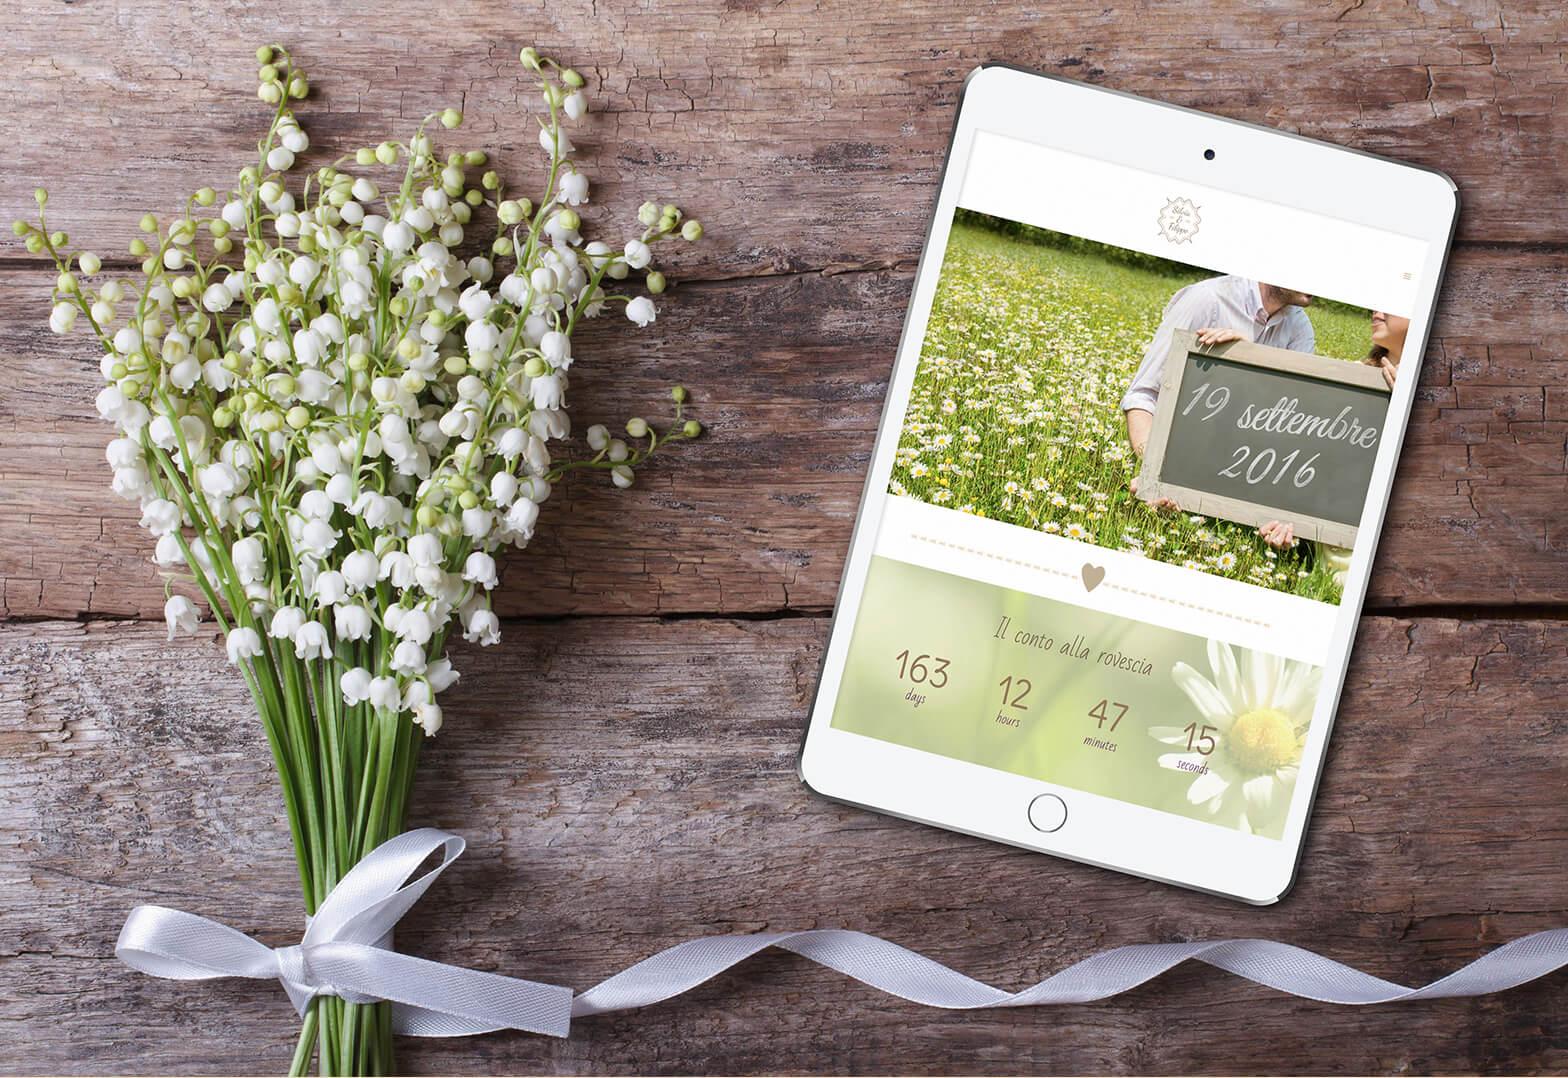 Wedding Web Site